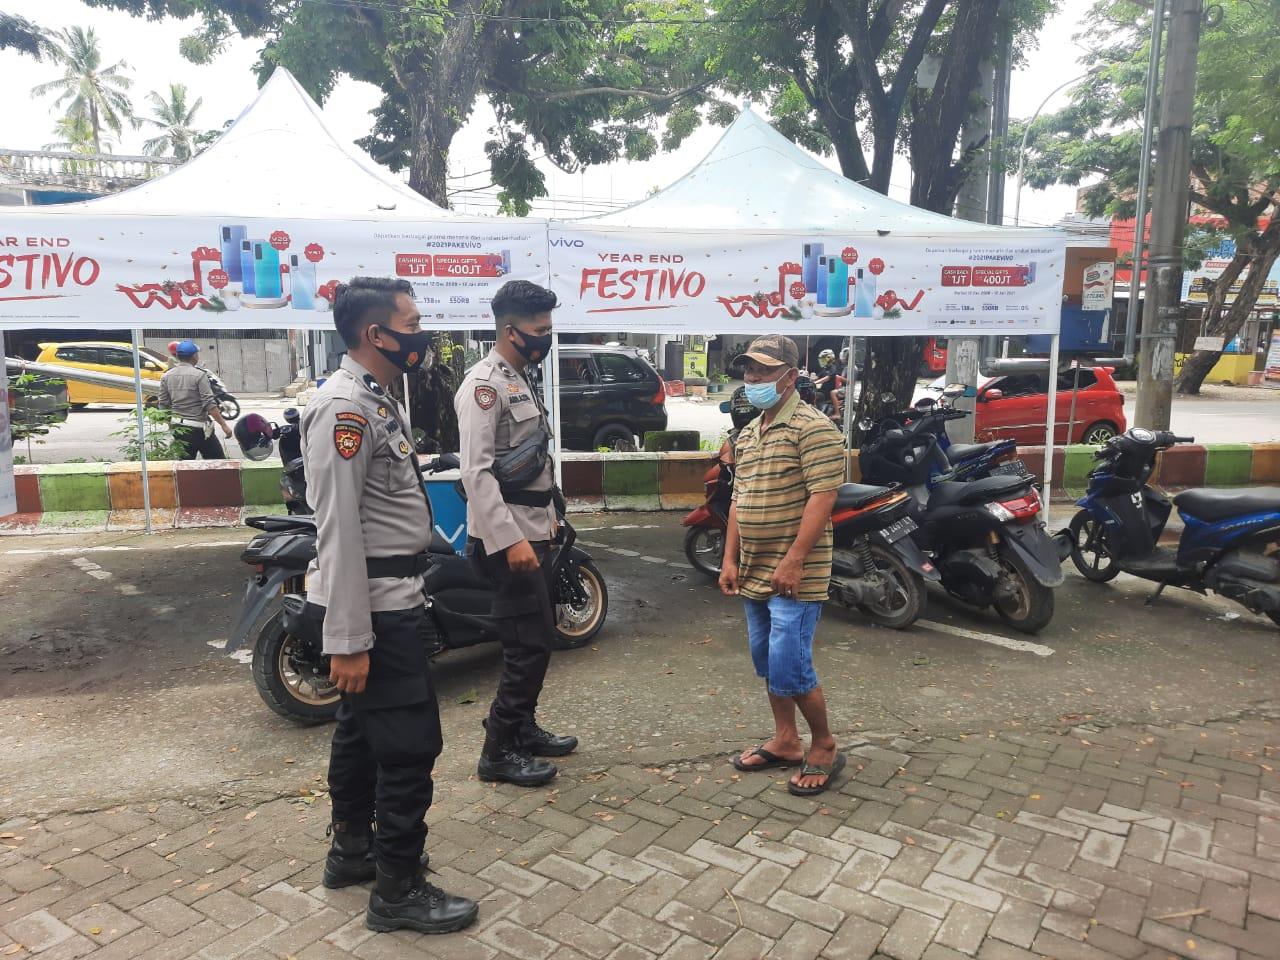 Antisipasi Gangguan Kamtibmas, Sat Sabhara Polres Sinjai Intens Patroli di Obyek Vital